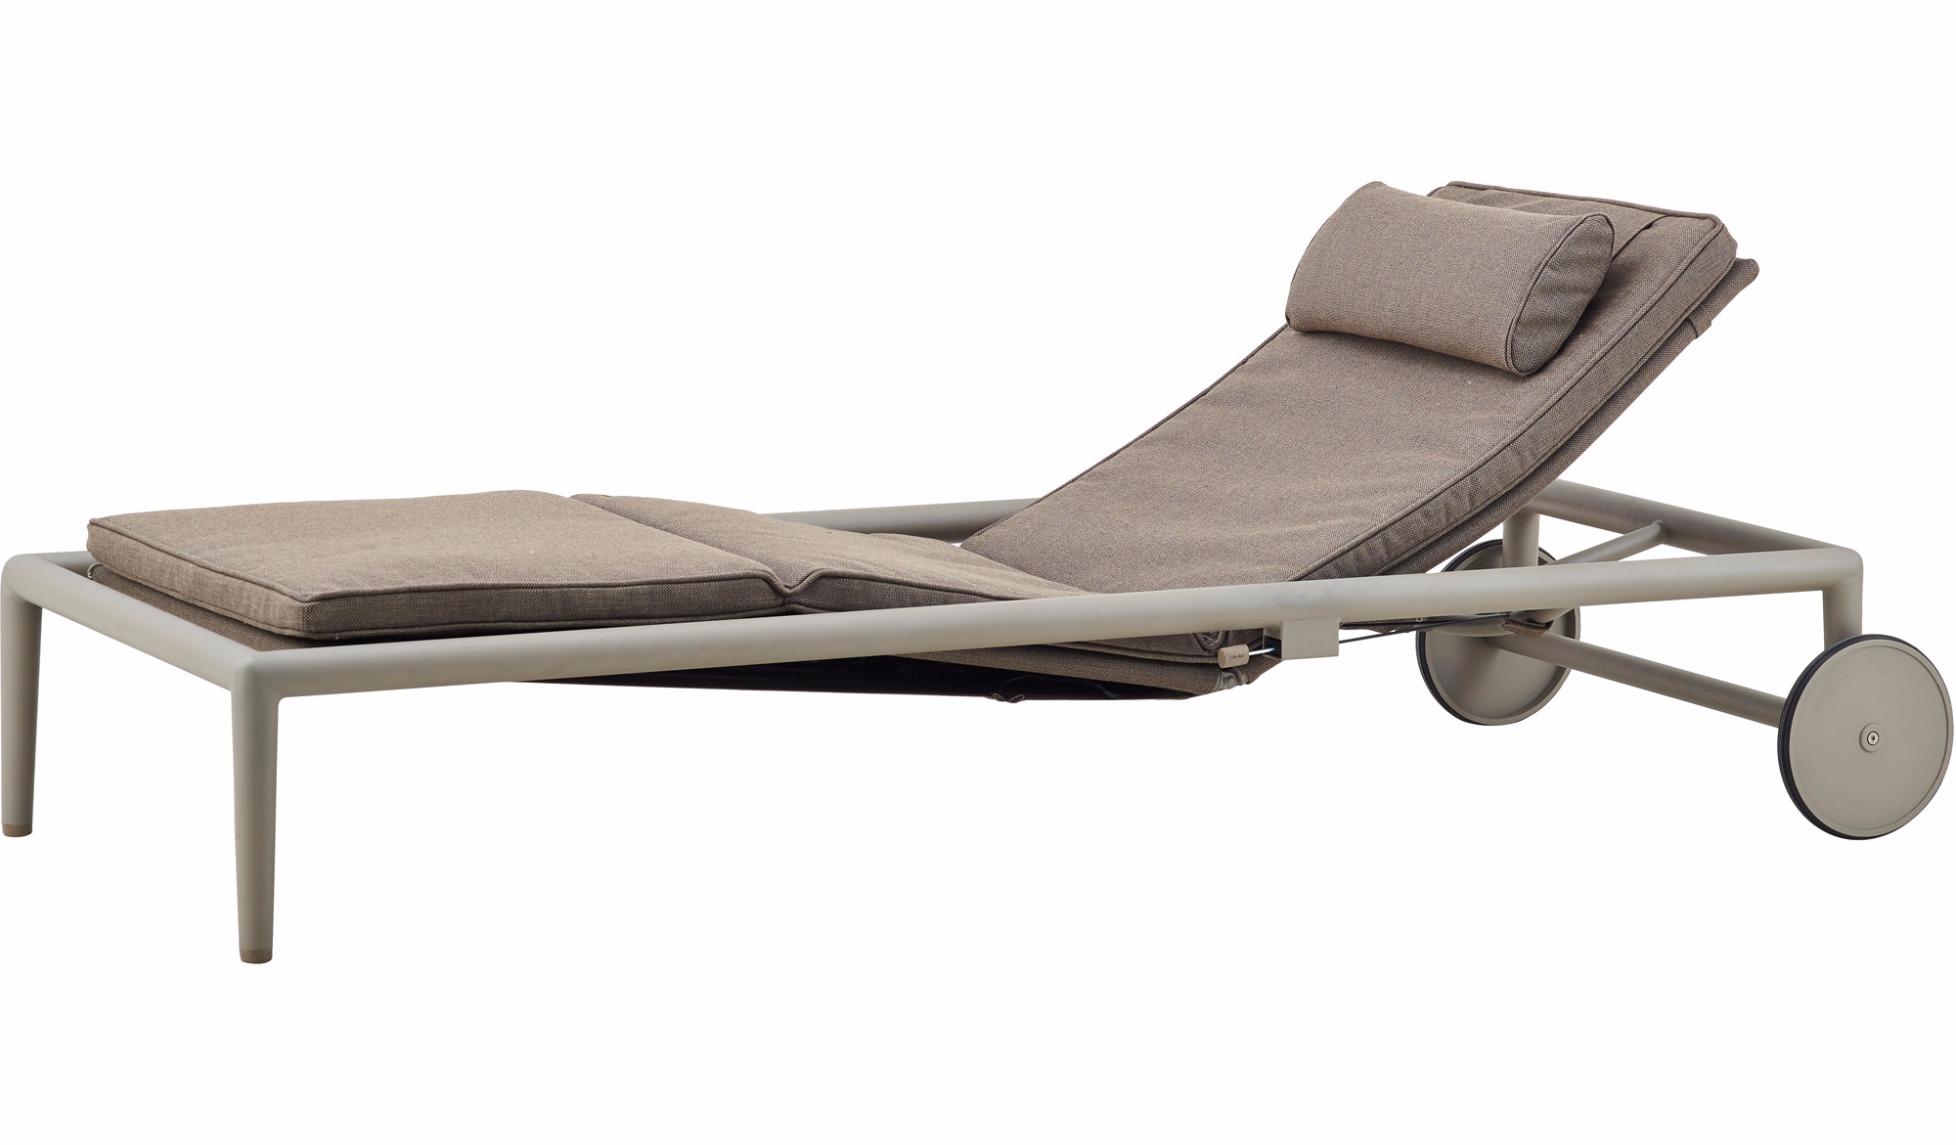 sonnenliege conic von cane line. Black Bedroom Furniture Sets. Home Design Ideas